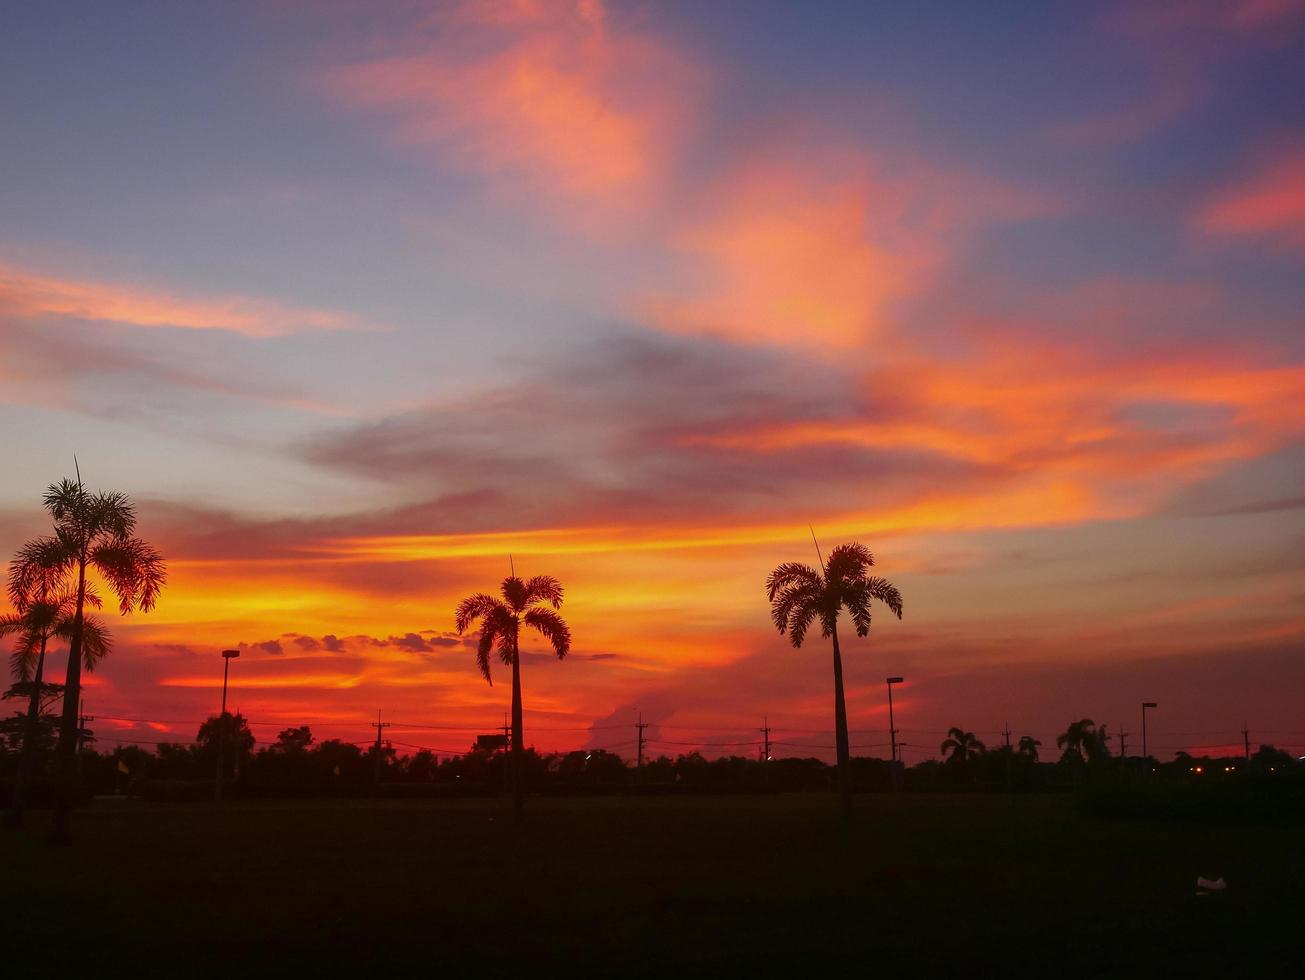 Schattenbild der Palmen bei Sonnenuntergang foto